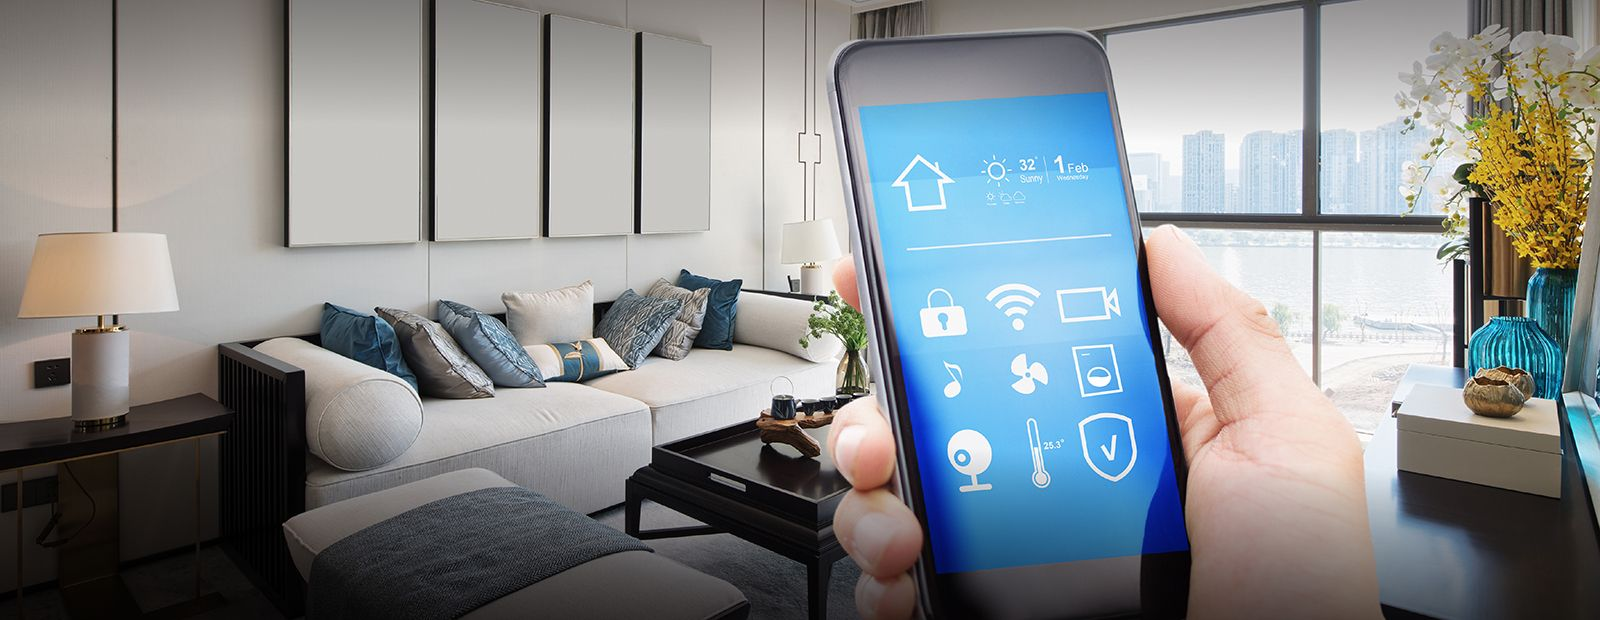 DIY-Budget-Friendly-Home-Automation_Blog-Header